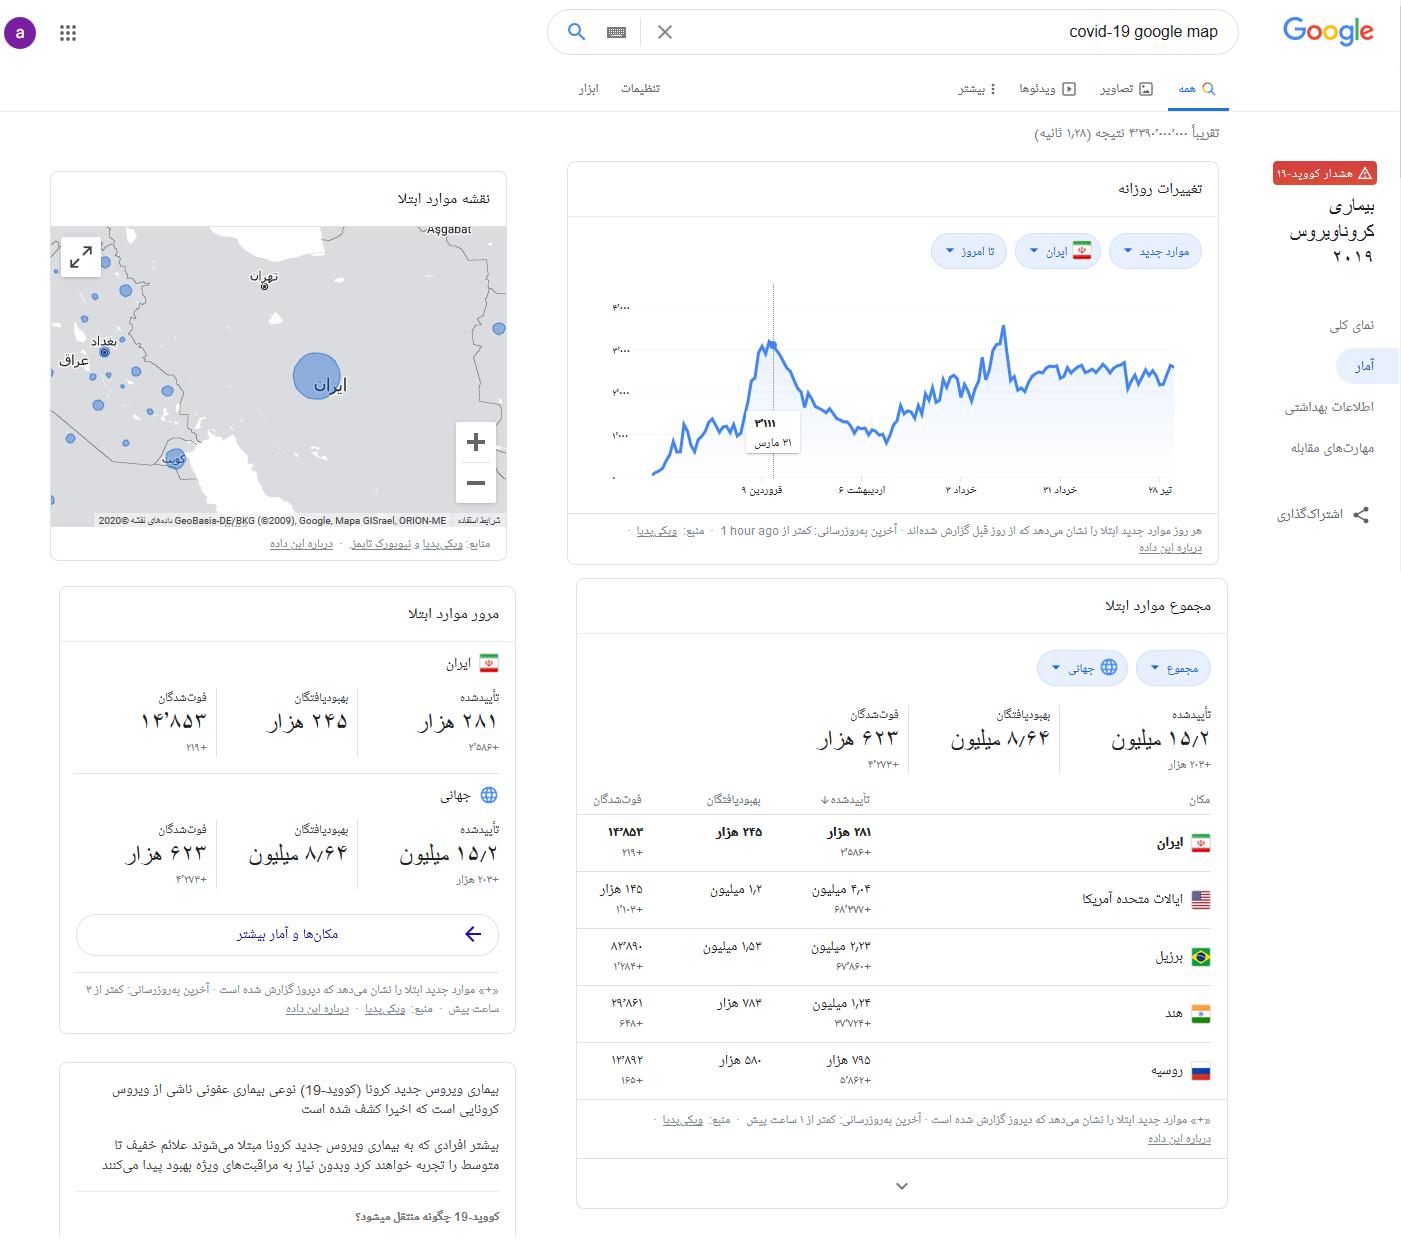 آمار کرونا از گوگل